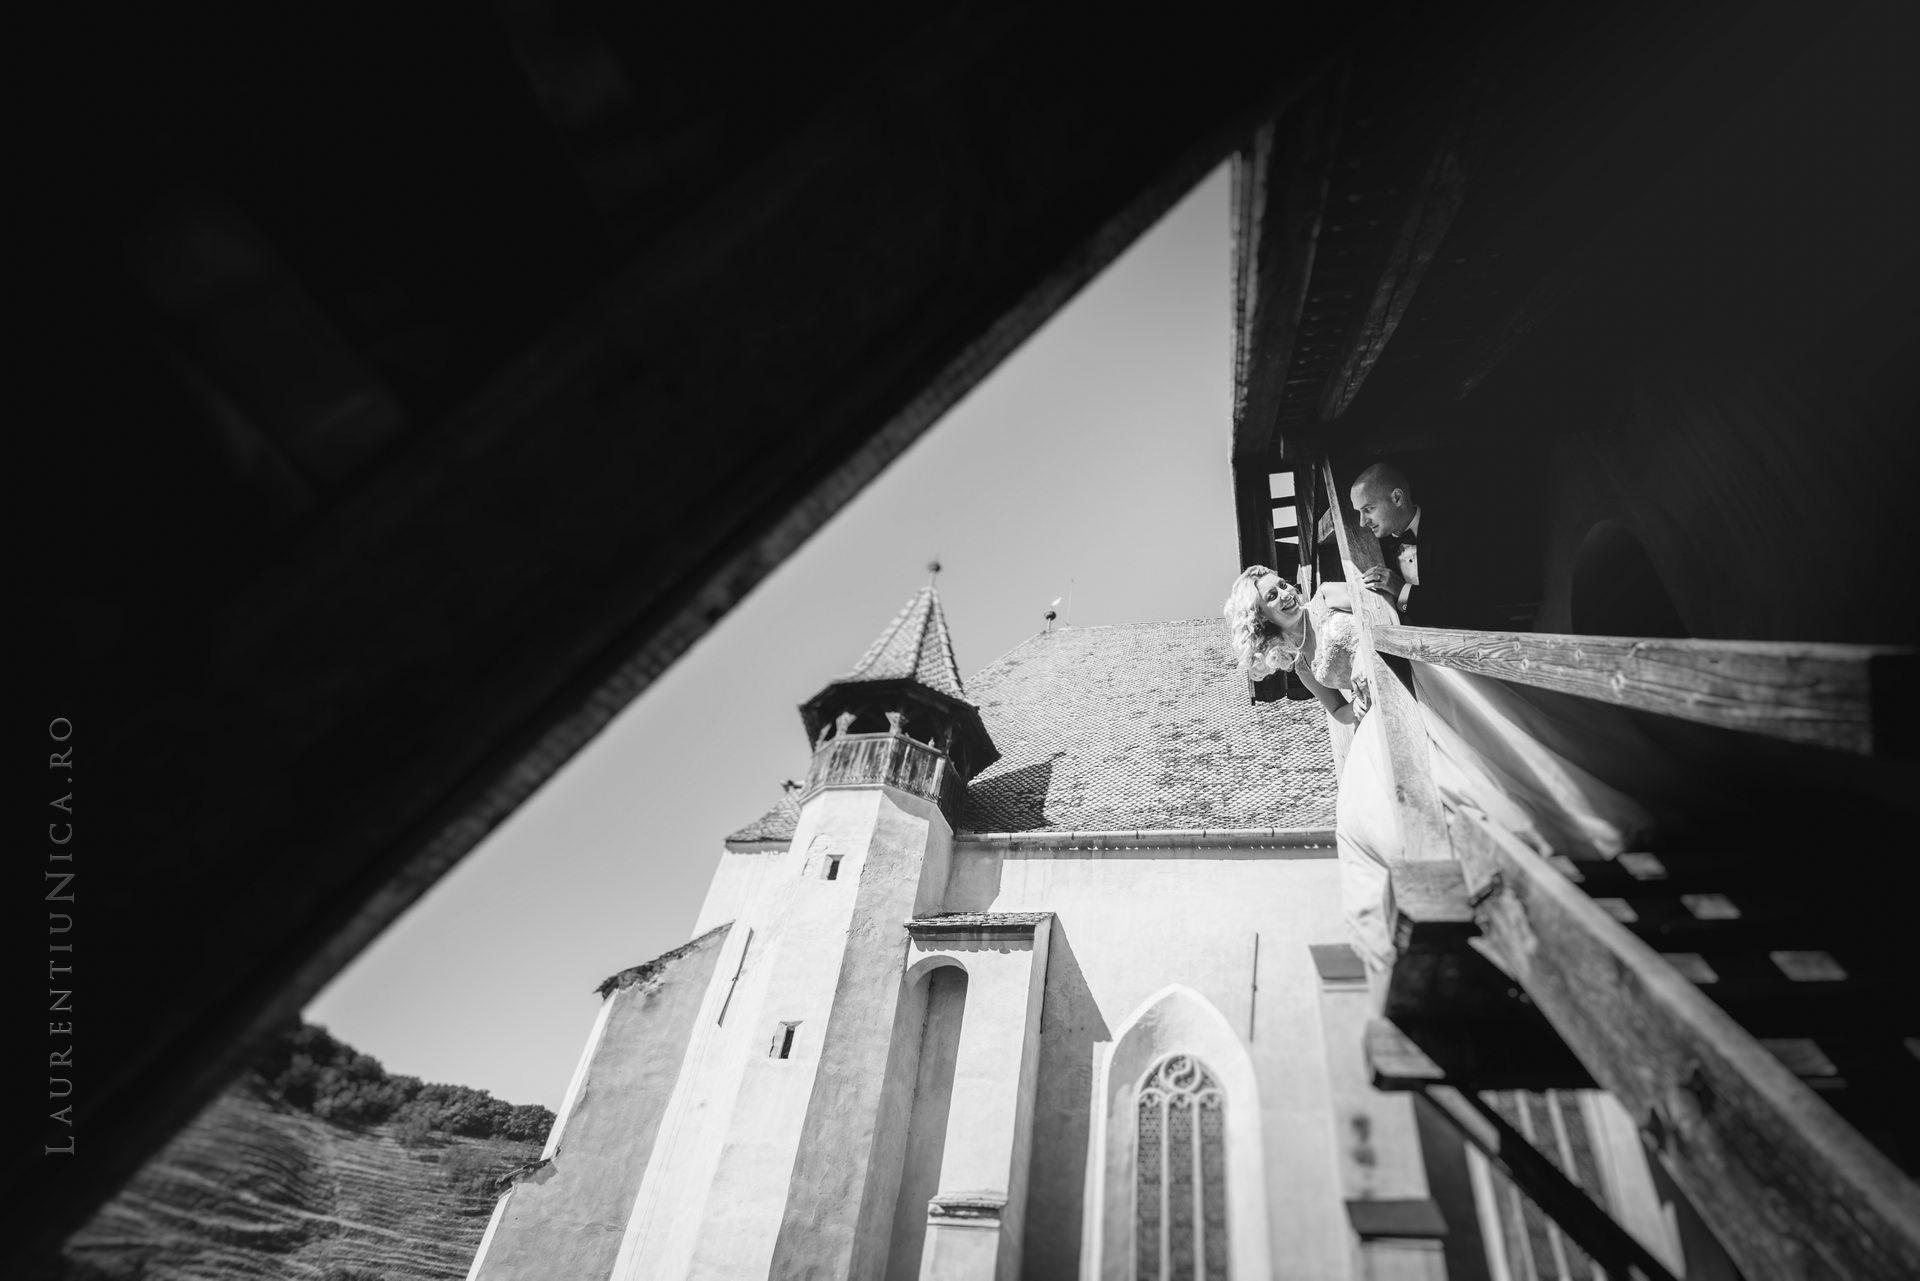 lavinia si adi fotograf laurentiu nica sighisoara biertan 017 - Lavinia & Adi | Fotografii After Wedding | Sighisoara & Biertan